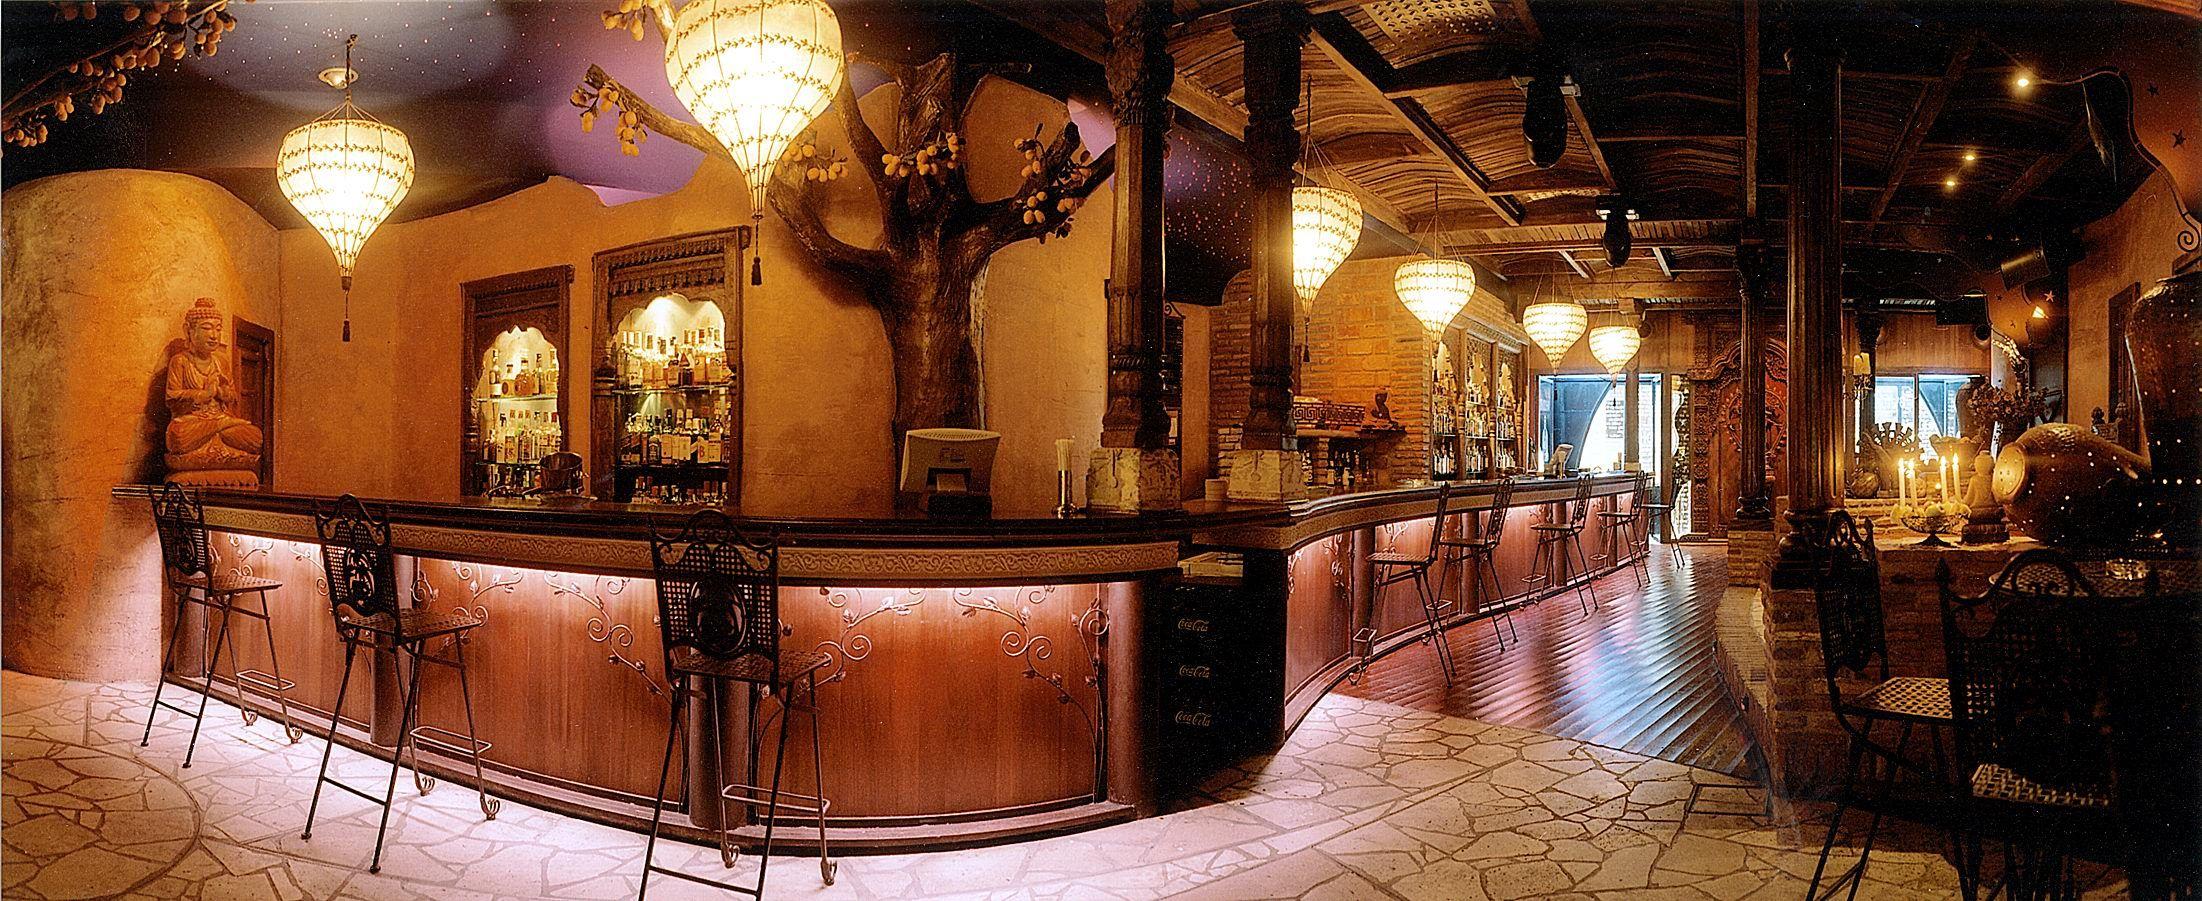 Decoracion de bares local tematico buddha en gijon newwd decoracion lugares para visitar - Decoracion bares tematicos ...